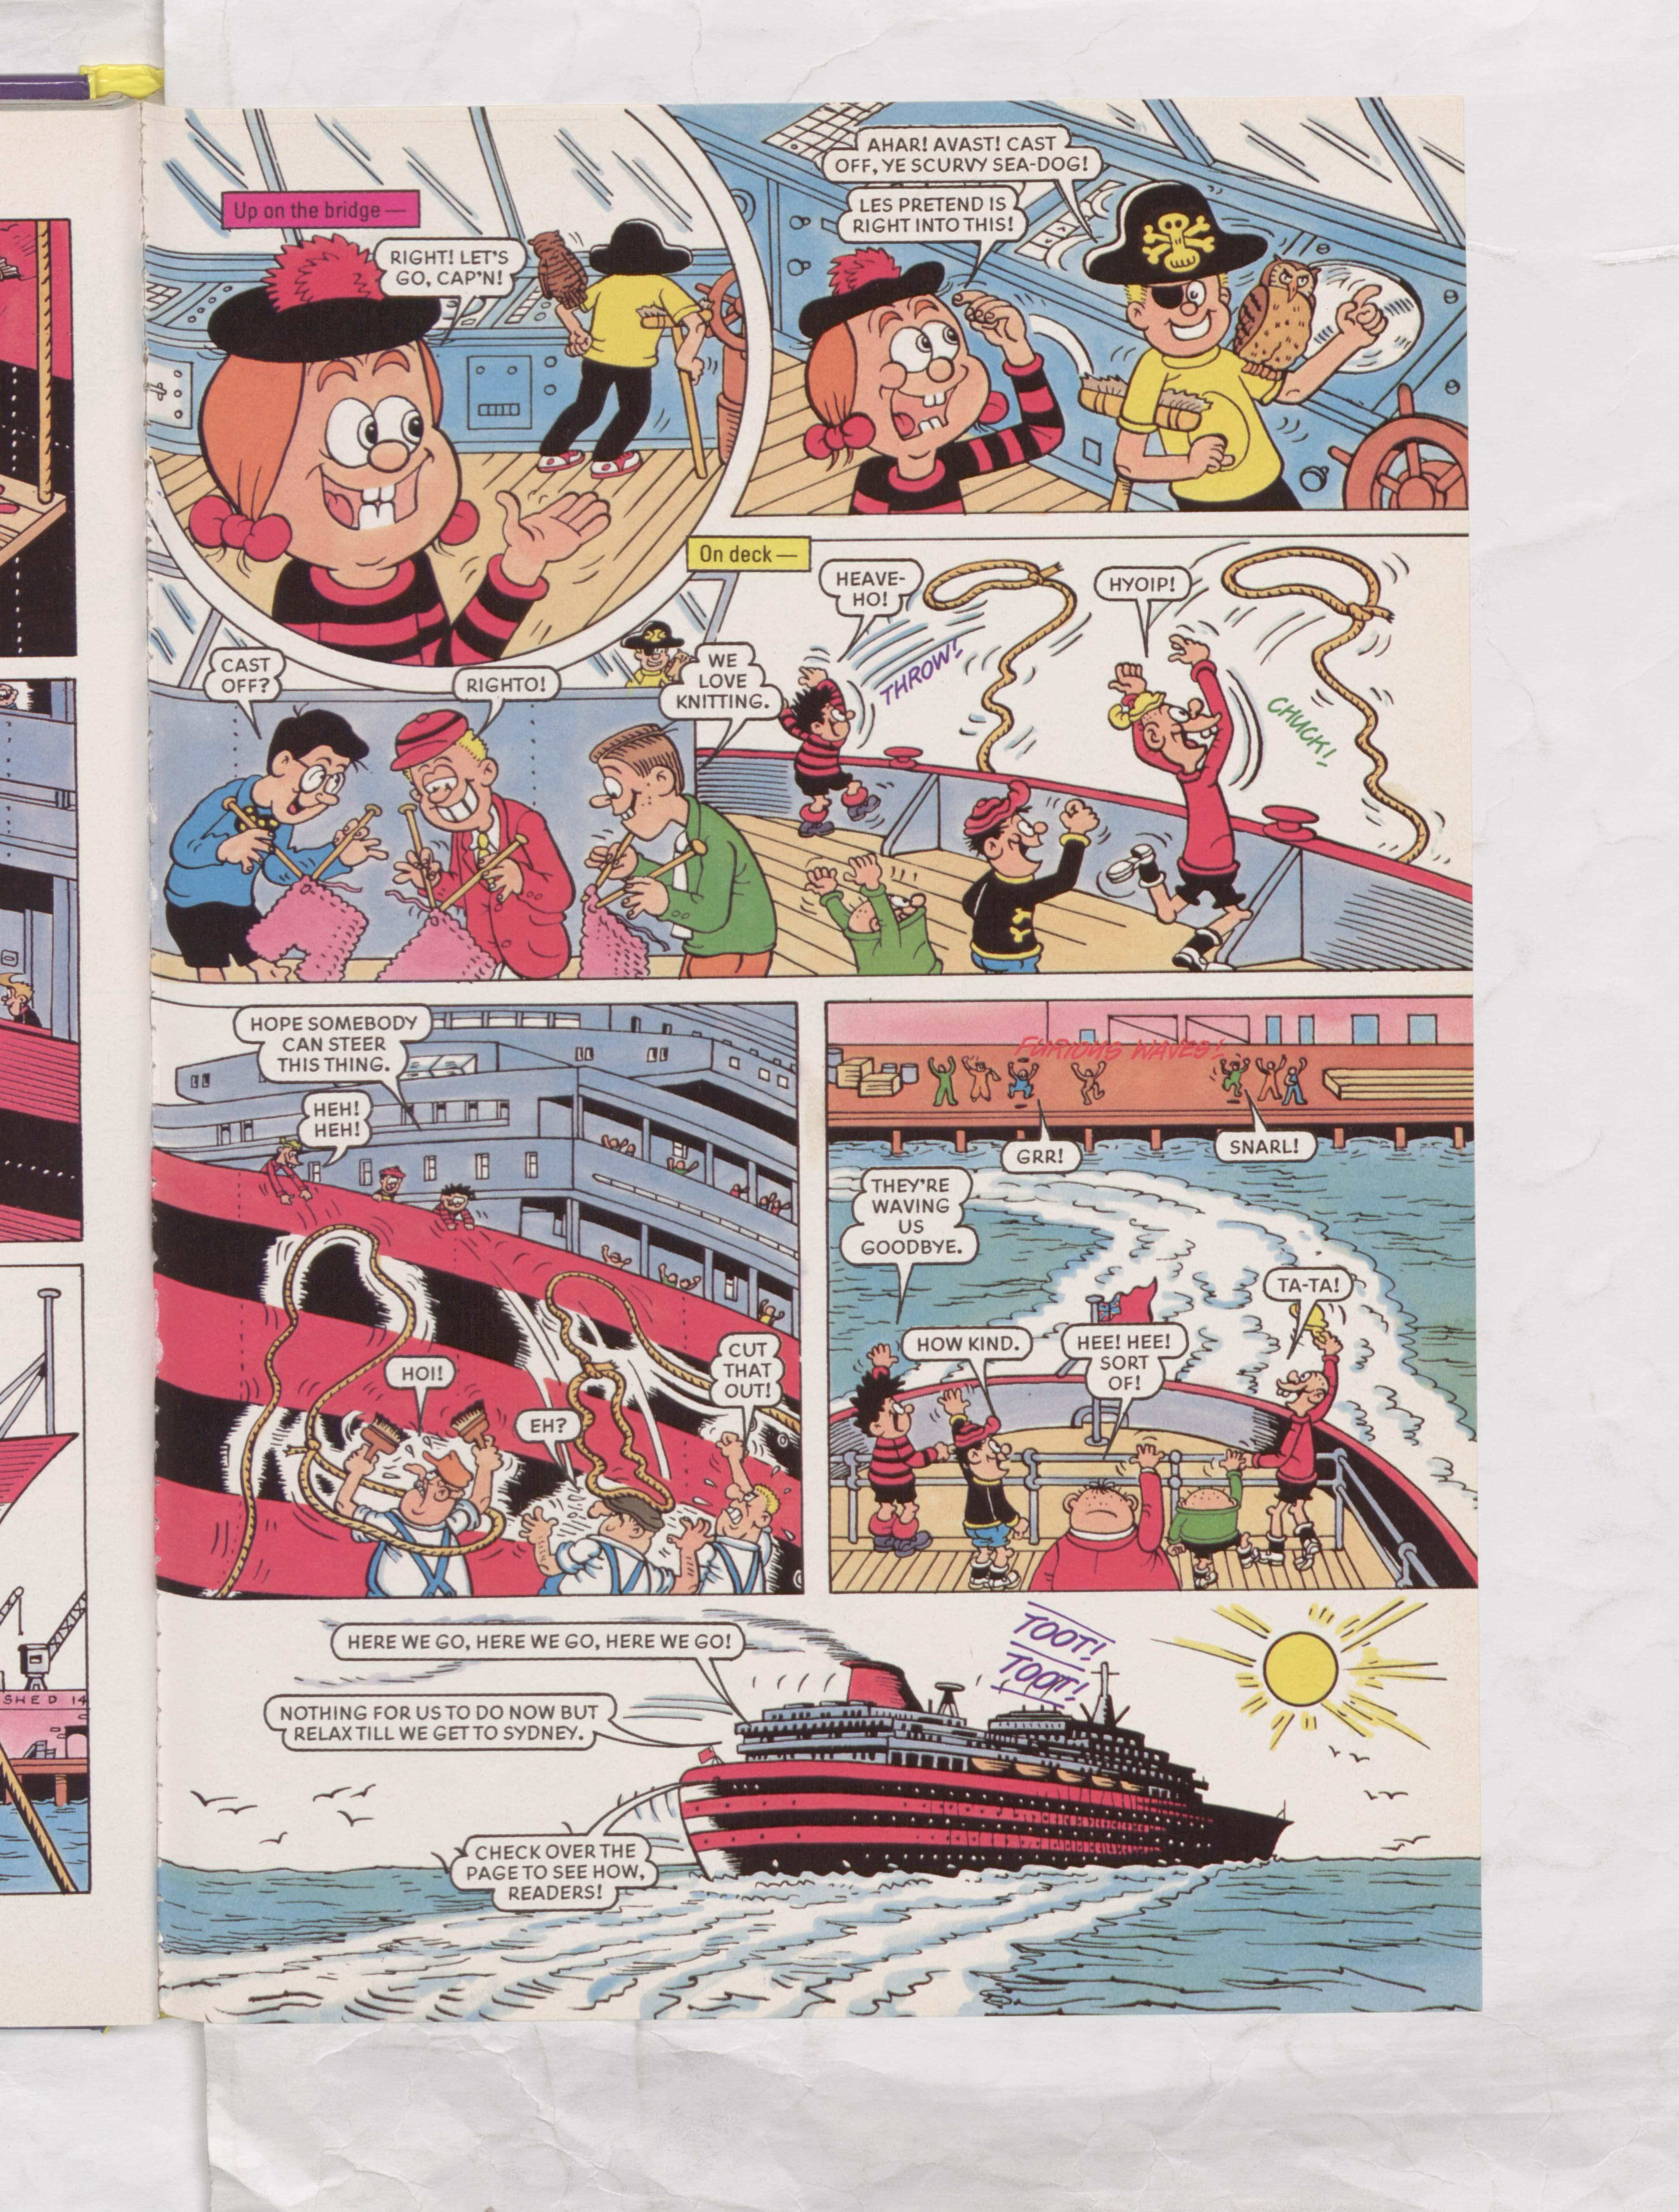 The Beano Stars Cruise Round the World - Beano Book 2000 Annual - Page 5